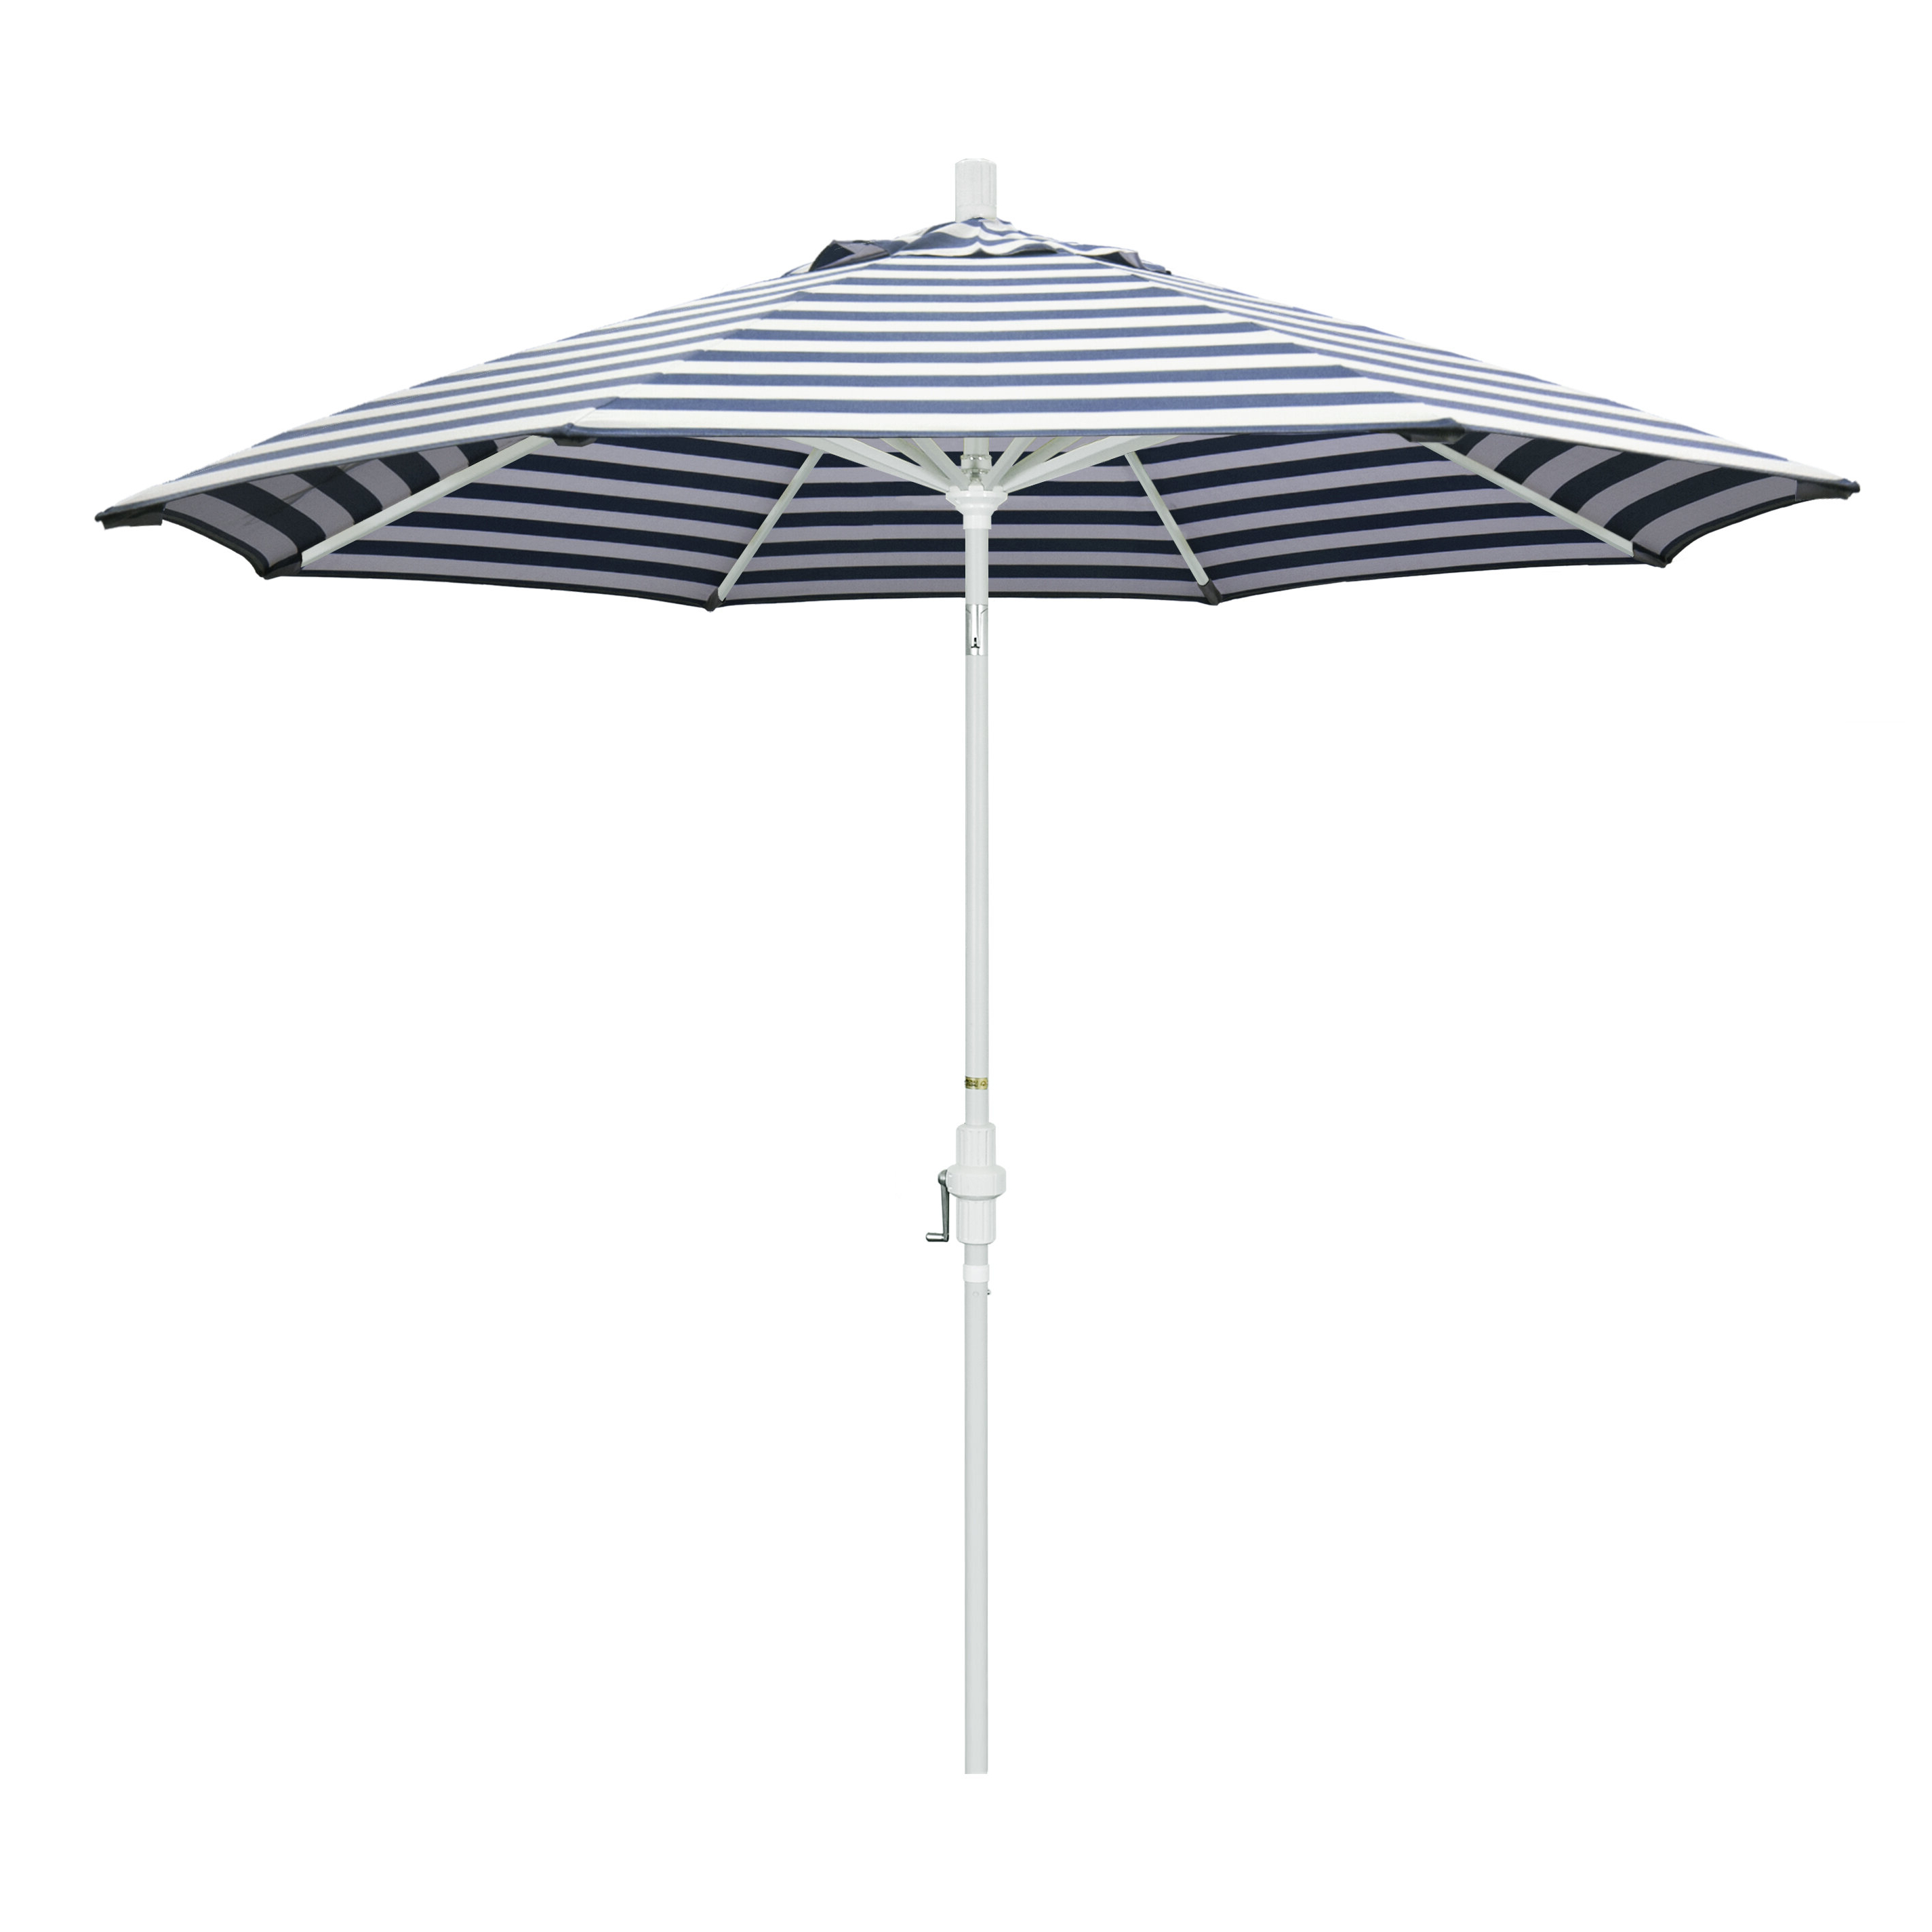 Aldan Market Umbrellas Pertaining To Most Popular 9' Market Umbrella (View 5 of 20)